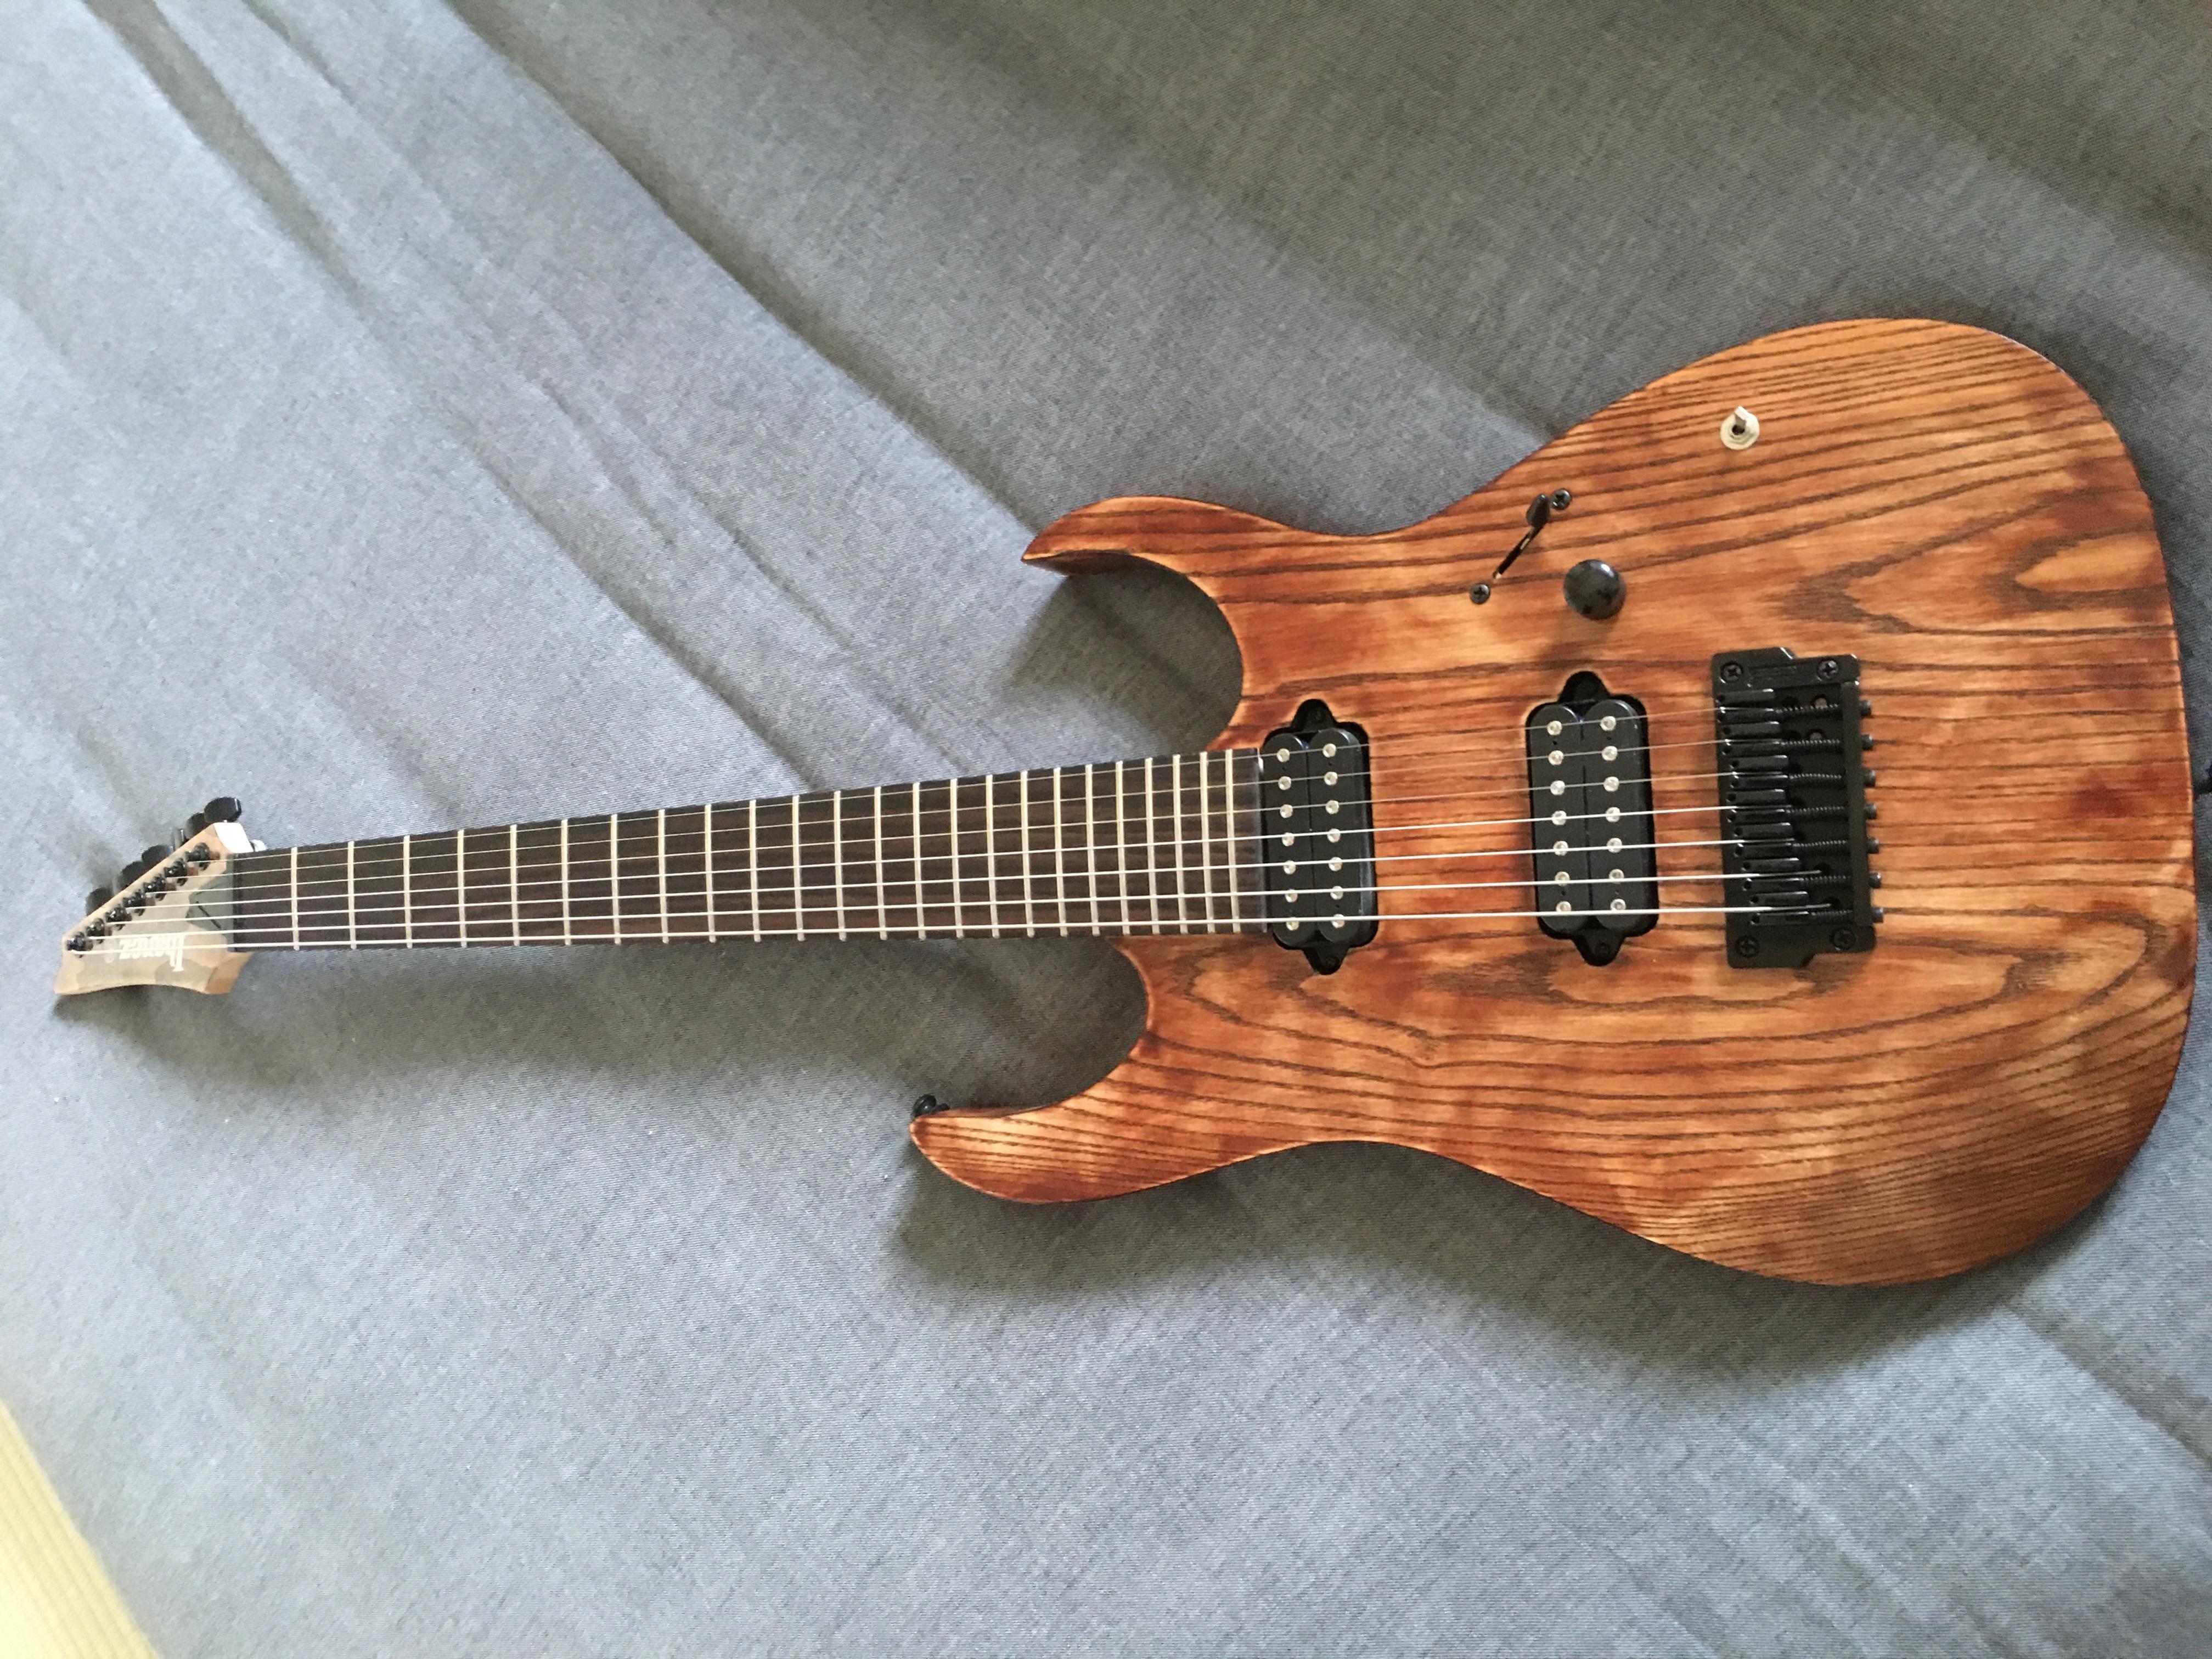 Bought a new guitar - RGIXL7-ABL-guitar-1-jpg